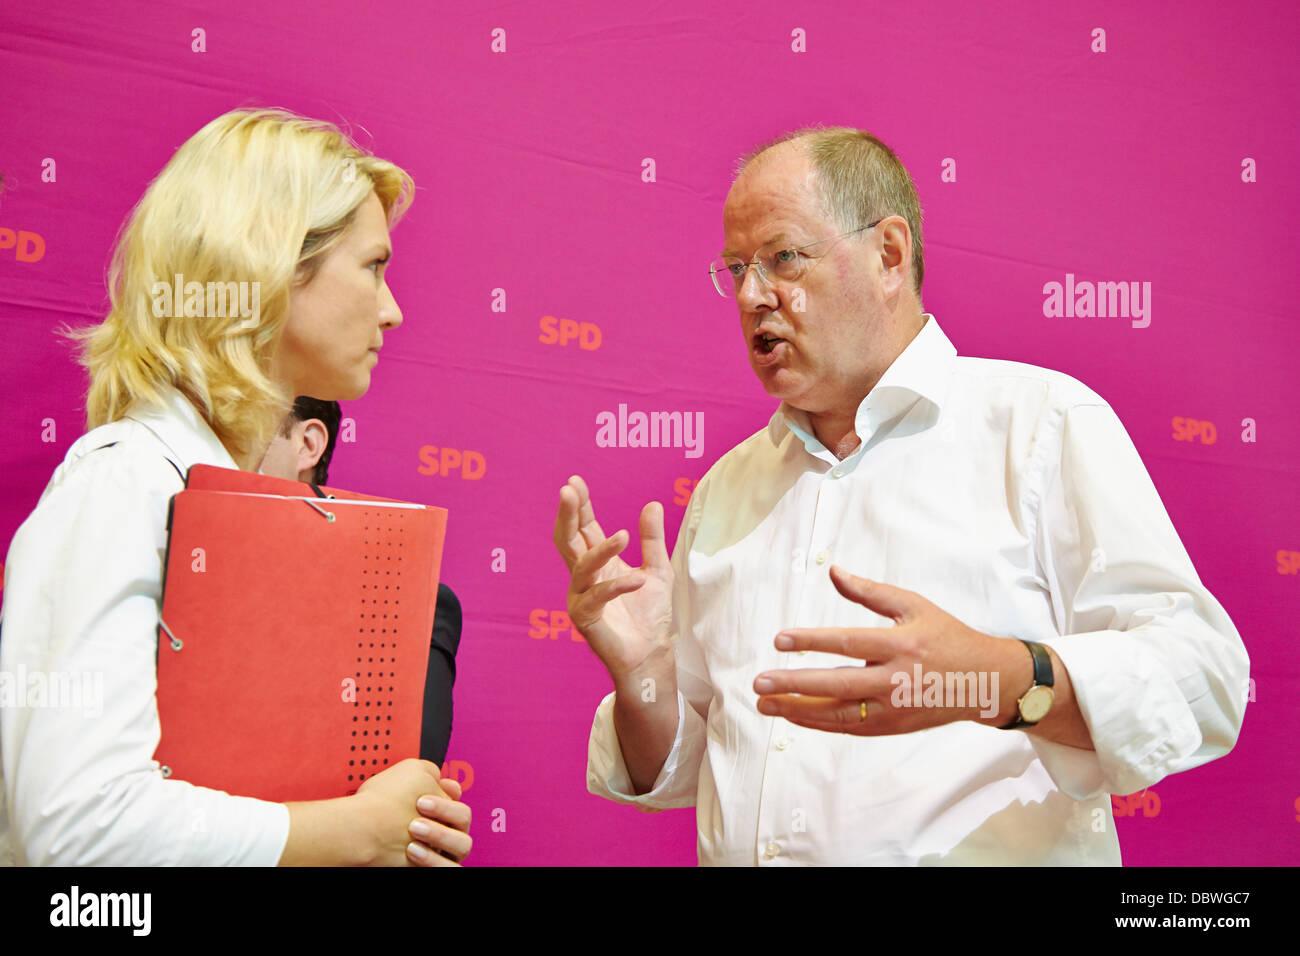 Berlin, German. 5th Aug, 2013. Peer Steinbrueck (SPD), SPD chancellor candidate, talking to Manuela Schwesig (SPD), - Stock Image